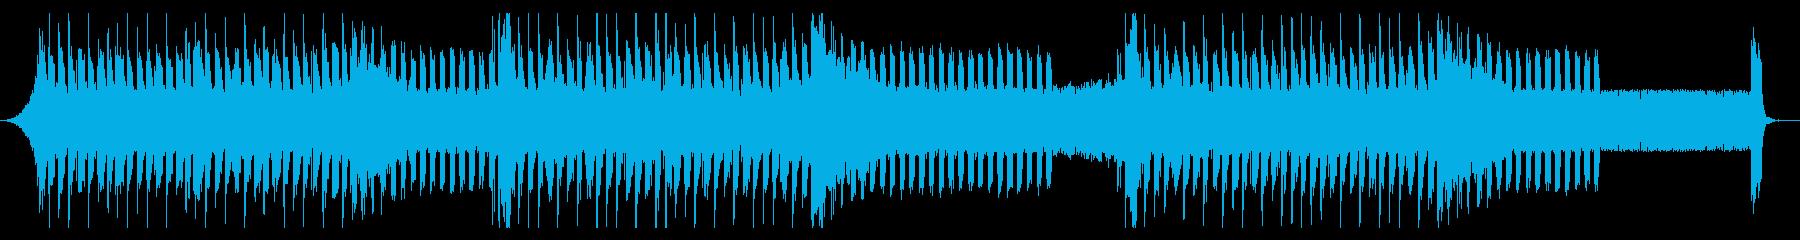 texture6の再生済みの波形